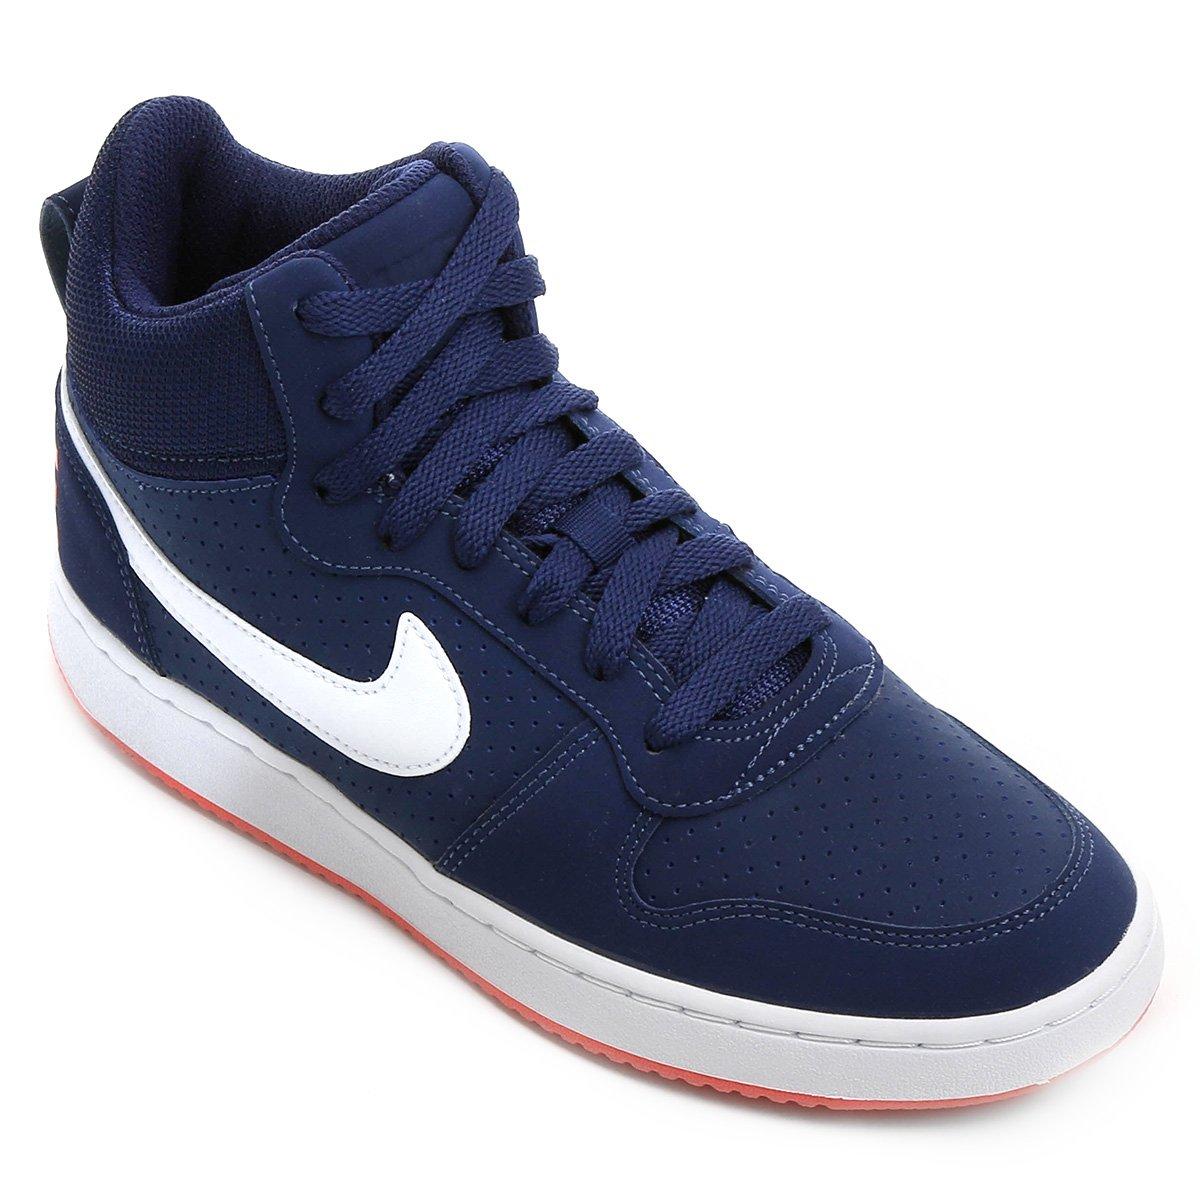 Tênis Couro Cano Alto Nike Recreation Mid Feminino Azul